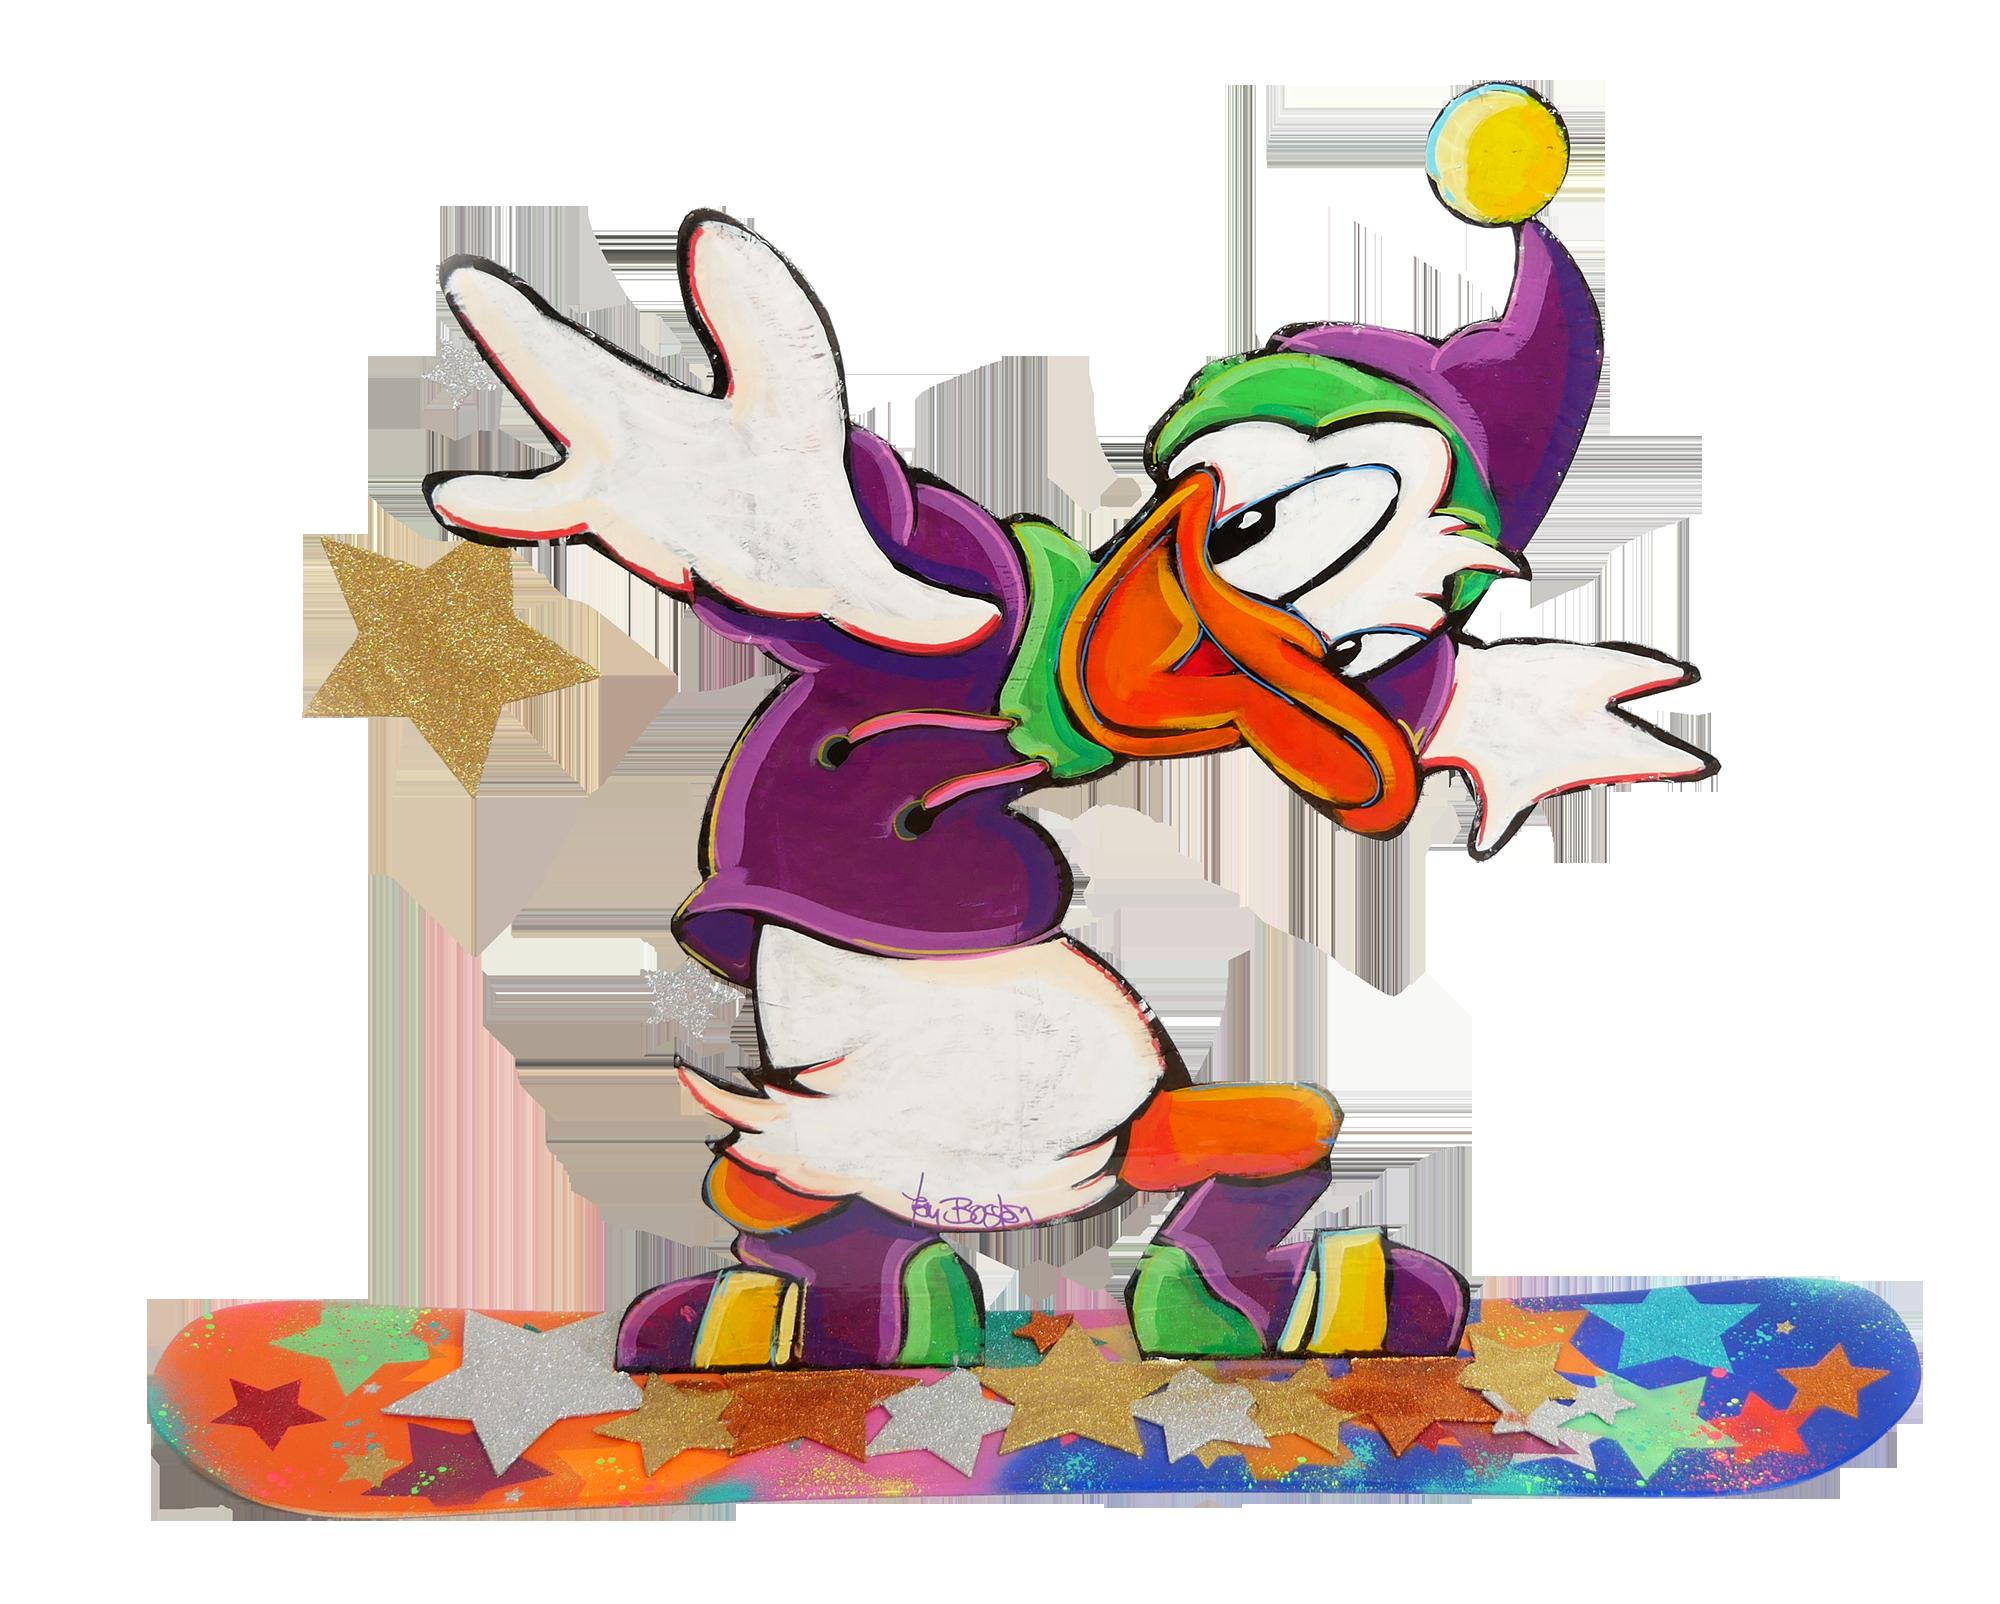 Tom Boston - Donald mit Snowboard , 8022-006-138